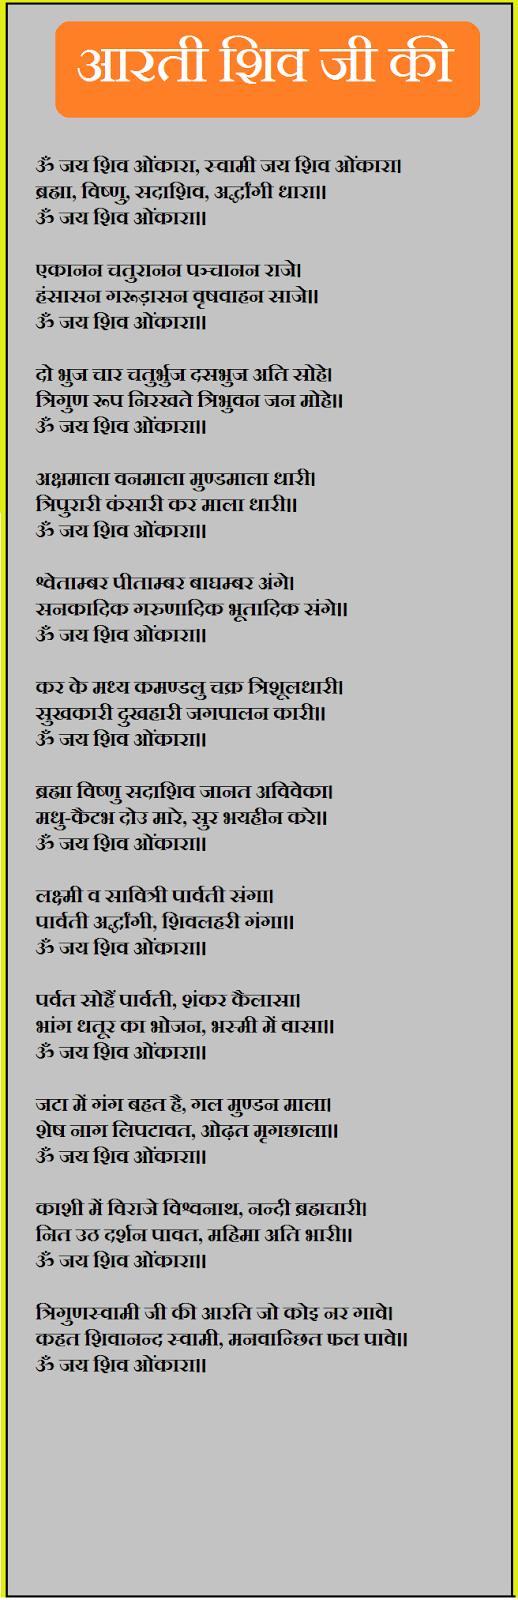 Aarti Shiv Ji Ki- ॐ जय शिव ओंकारा – Om Jai Shiv Omkara- आरती शिव जी की